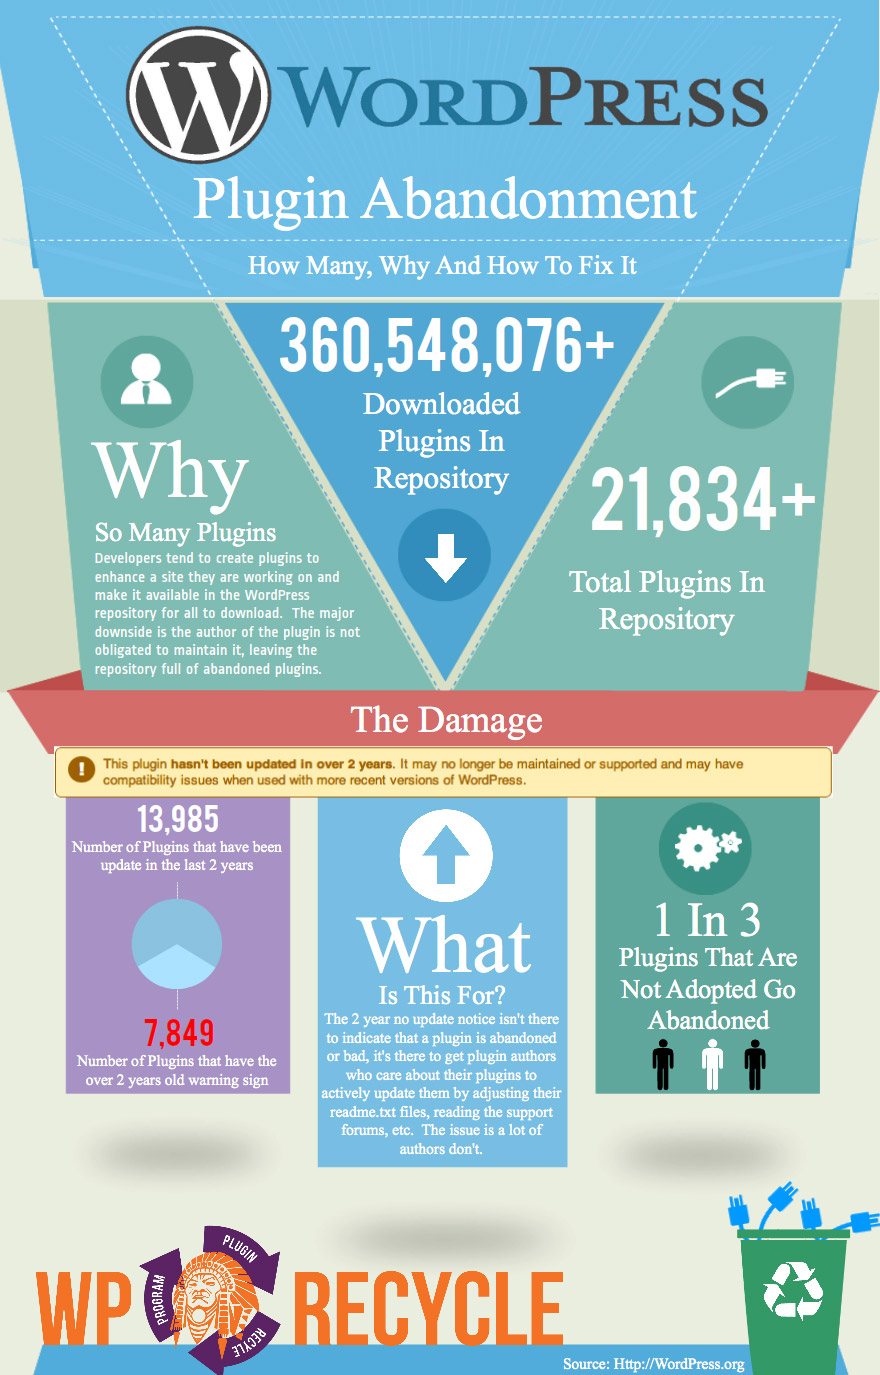 infographic-abandoned-wp-plugins.jpg